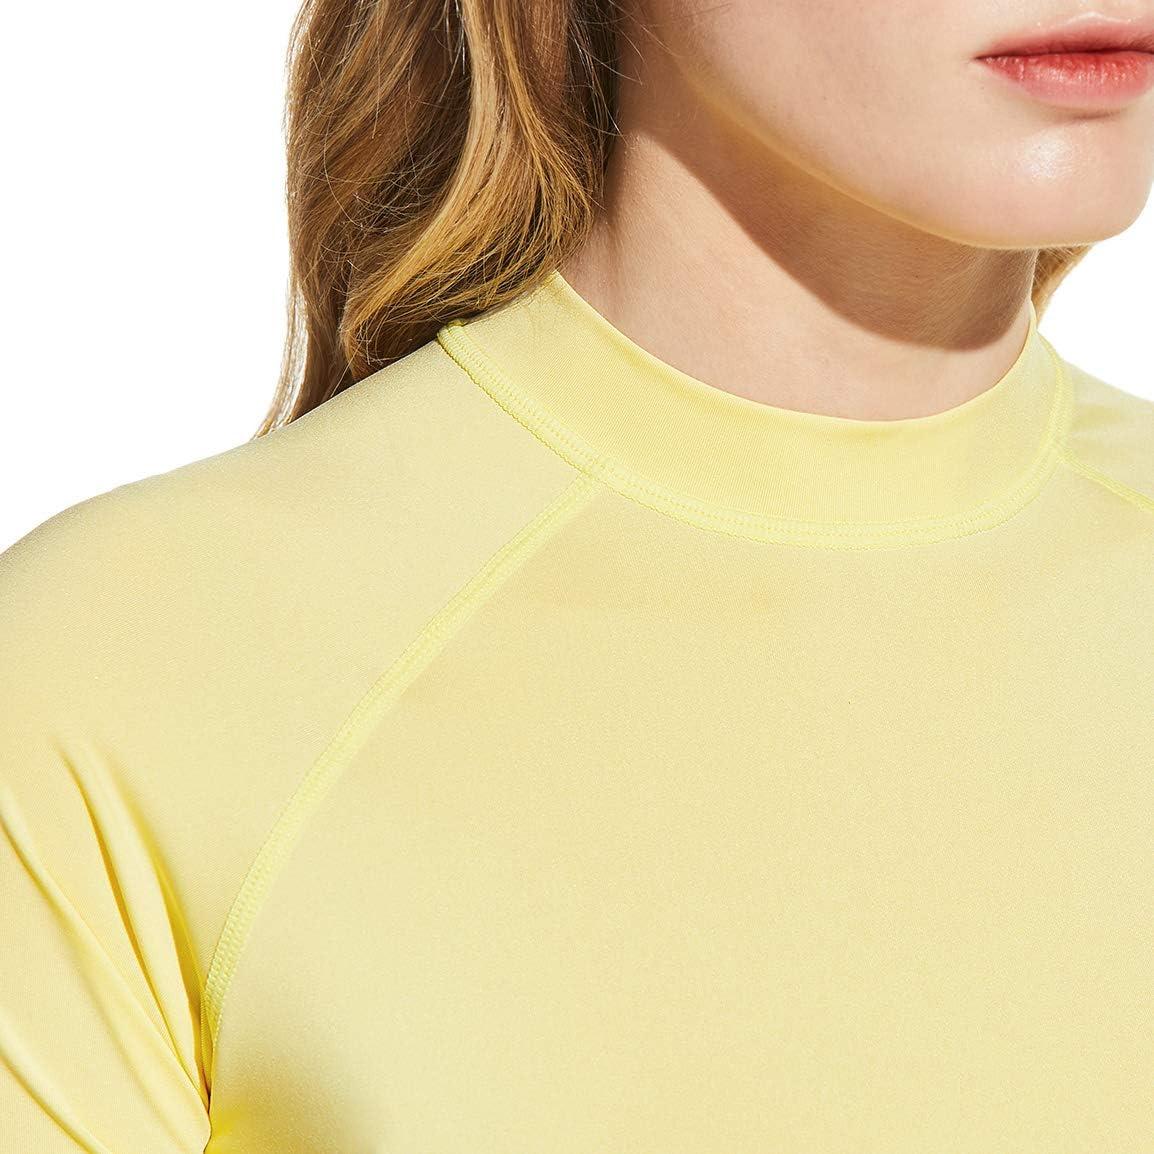 TSLA Womens UPF 50 UV//SPF Surf Swim Shirts Water Beach Swimsuit Top Rash Guard Short Sleeve